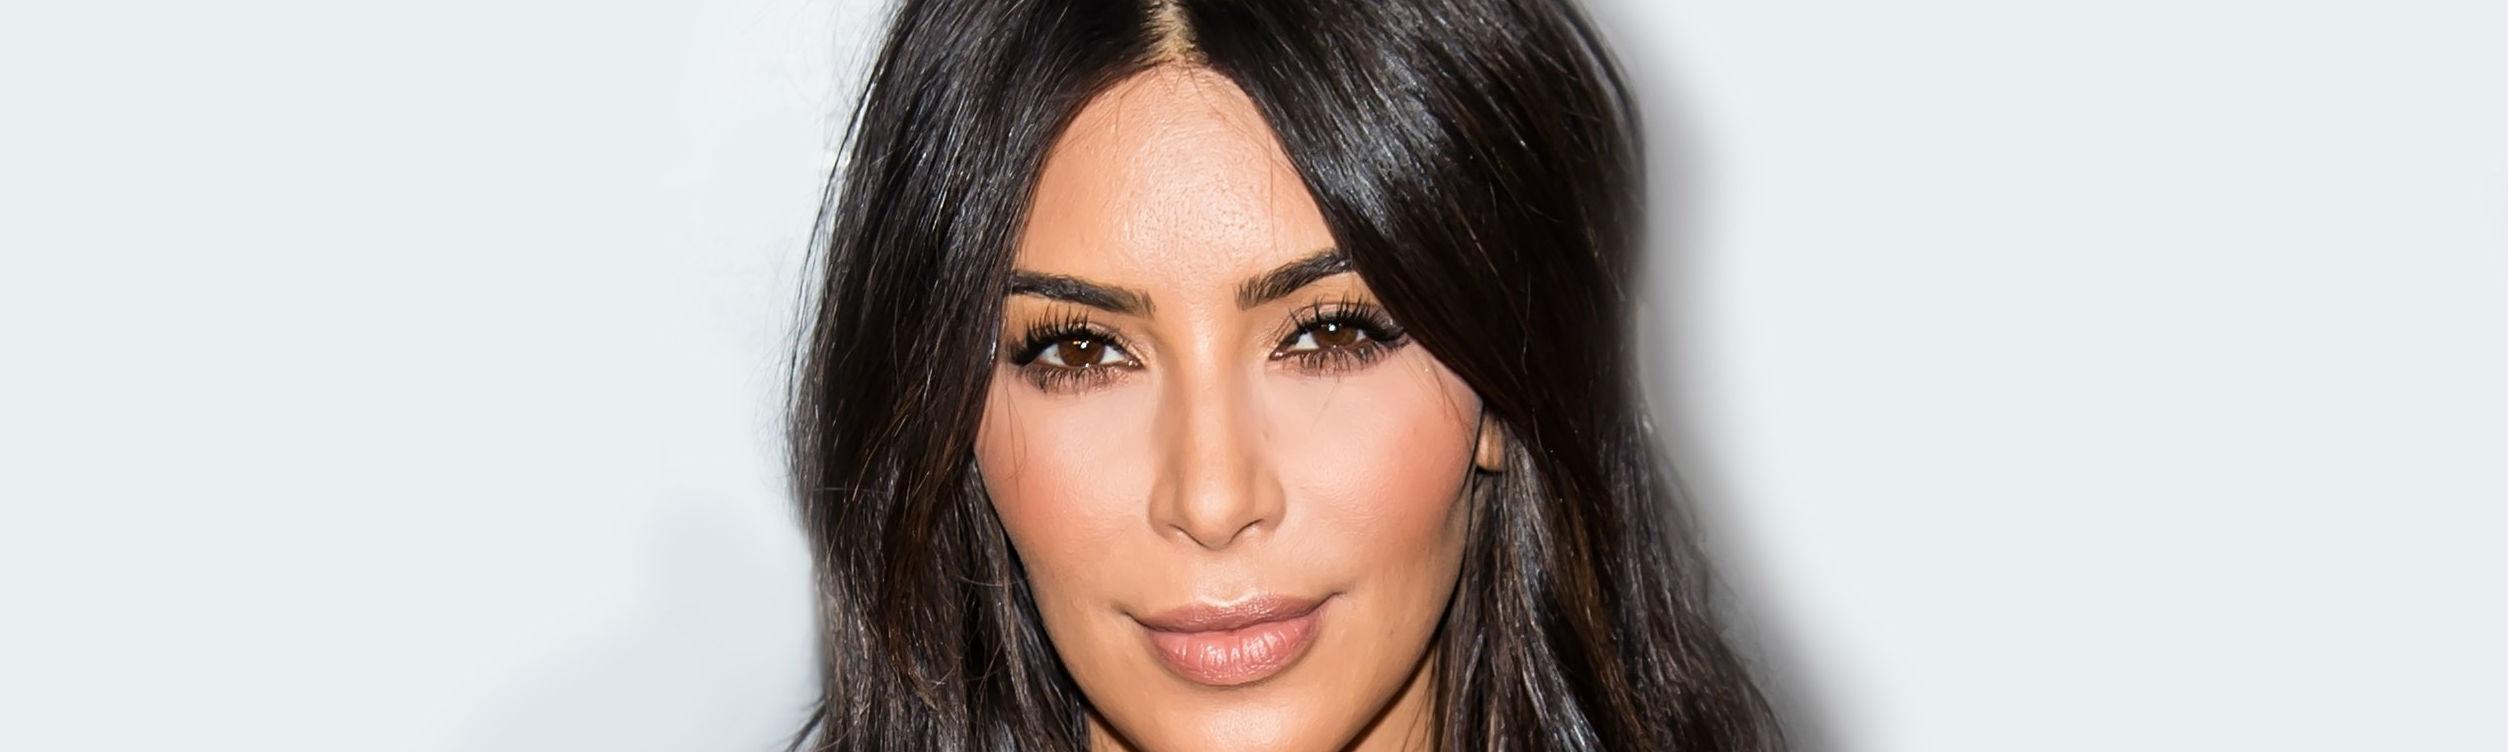 Kim kardashian nontouring social